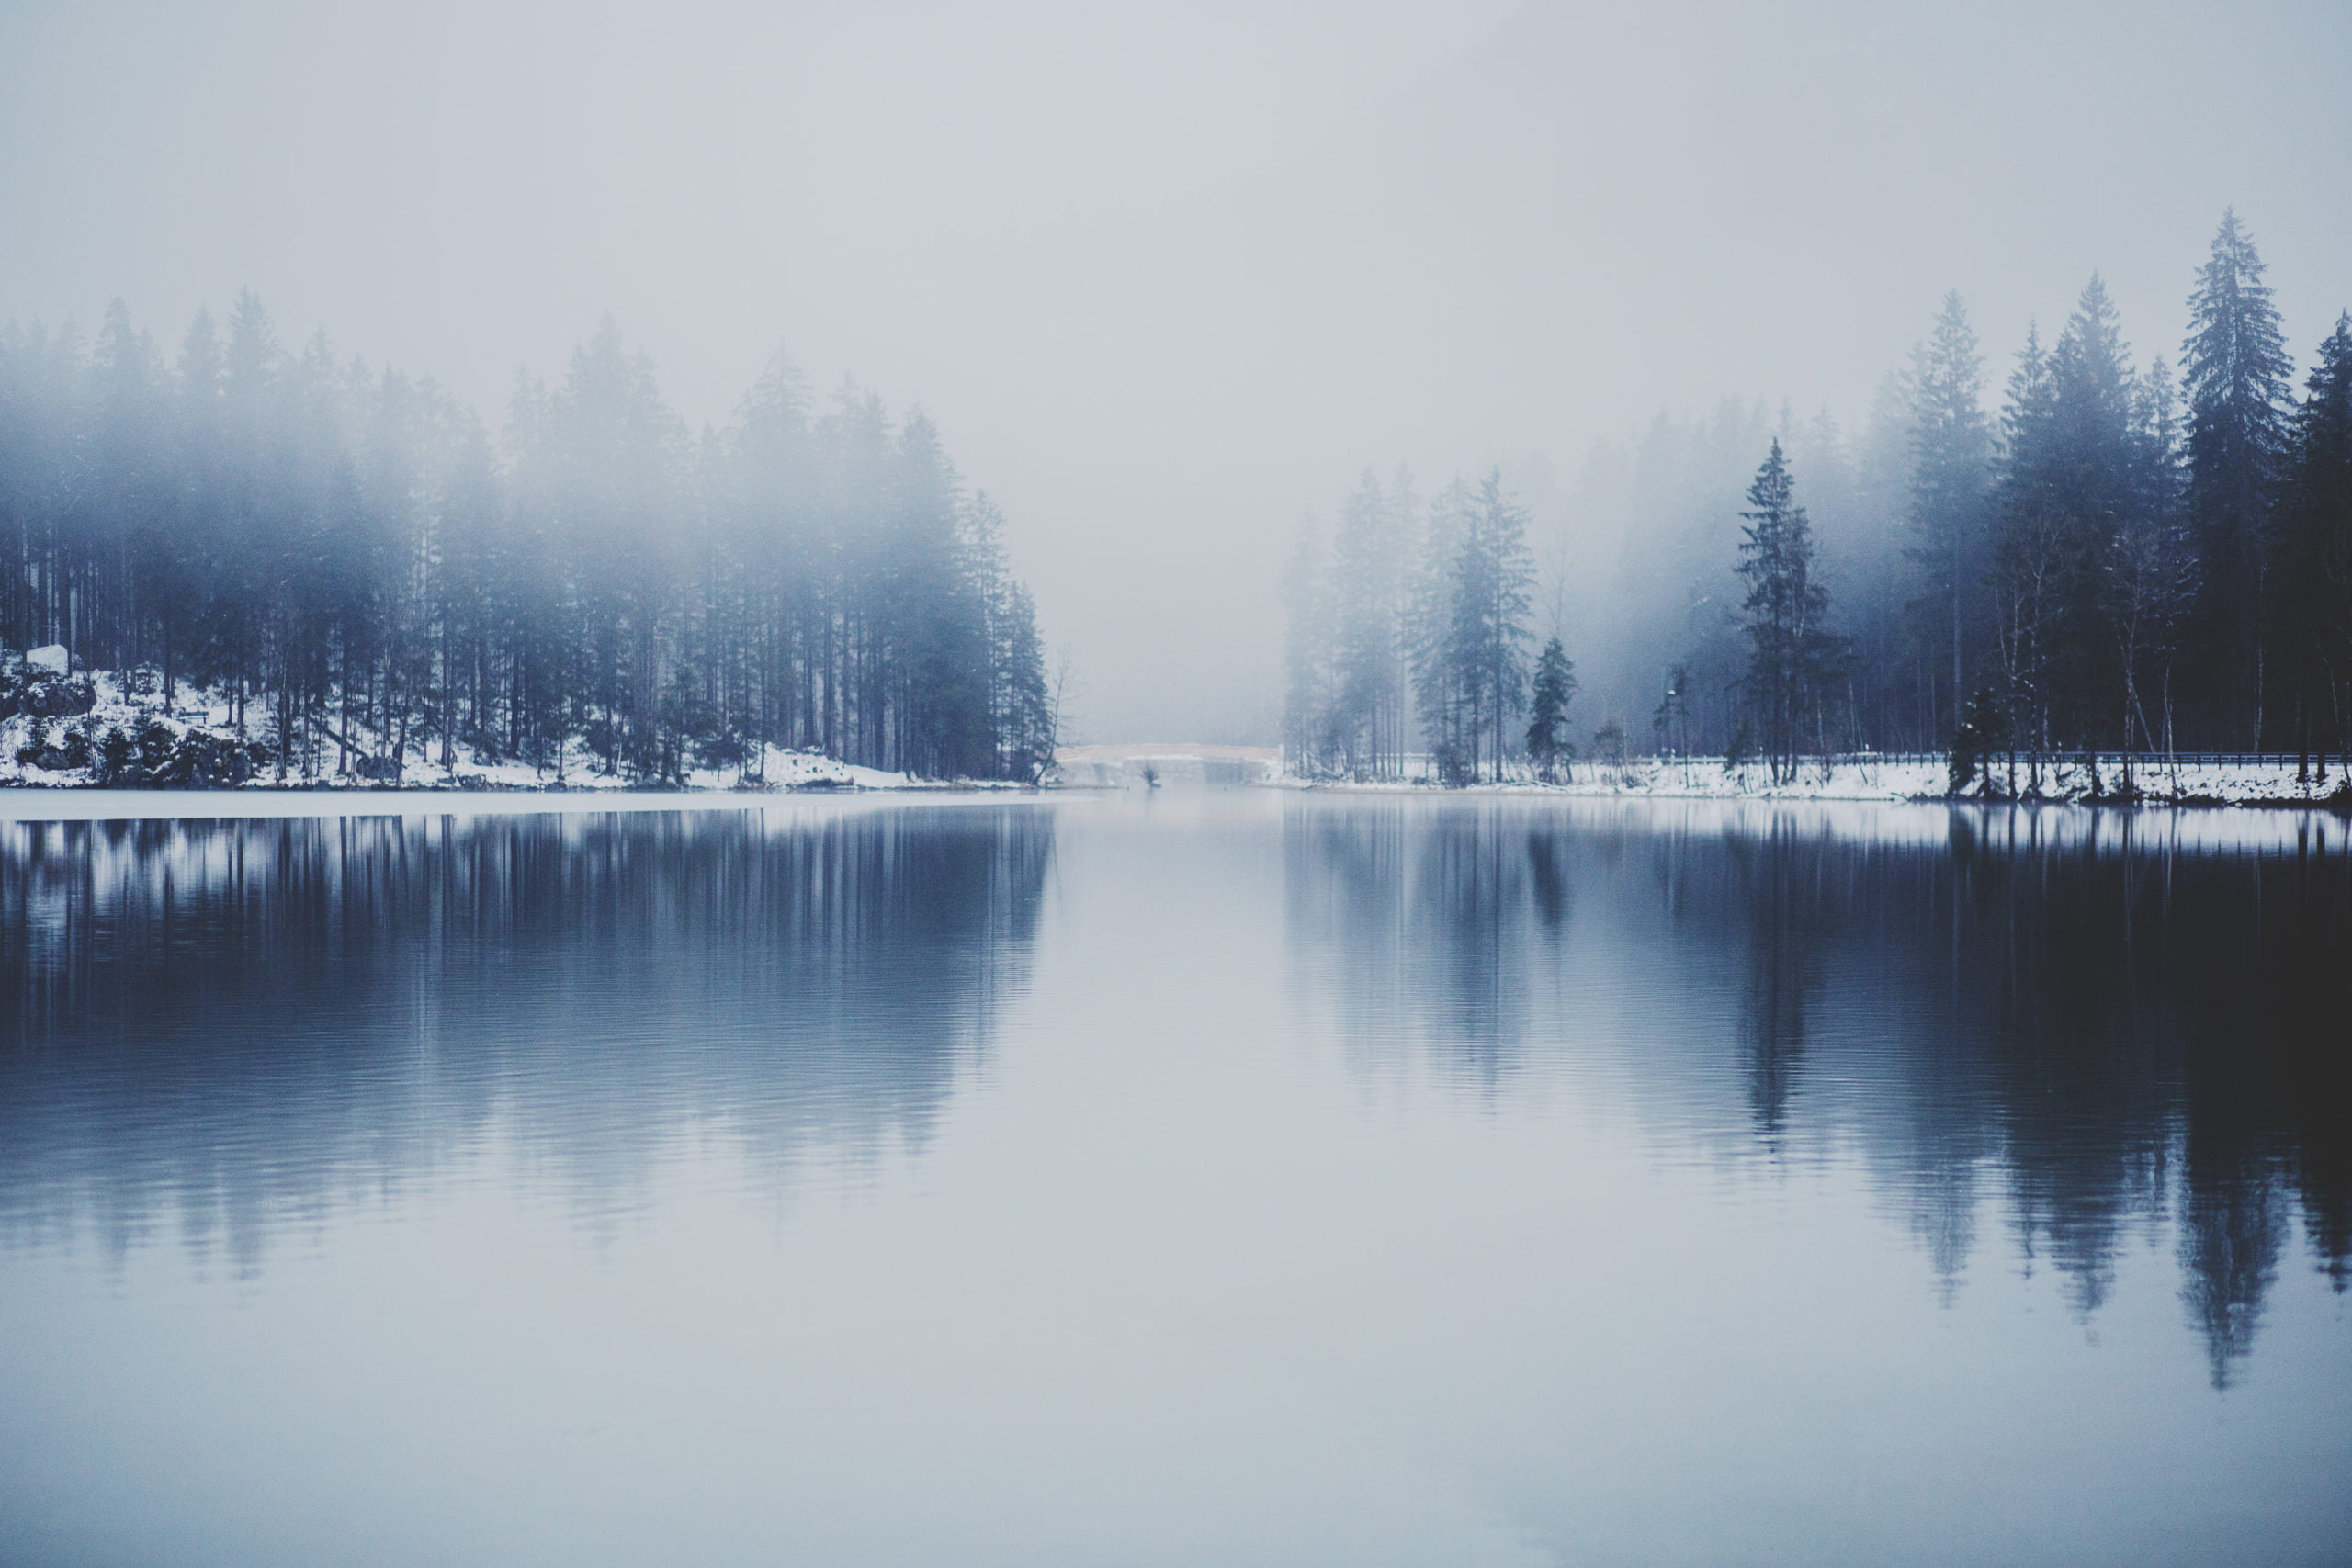 white snow river lake 20161112 1 1 scaled 另一半|LIPS 一行詩